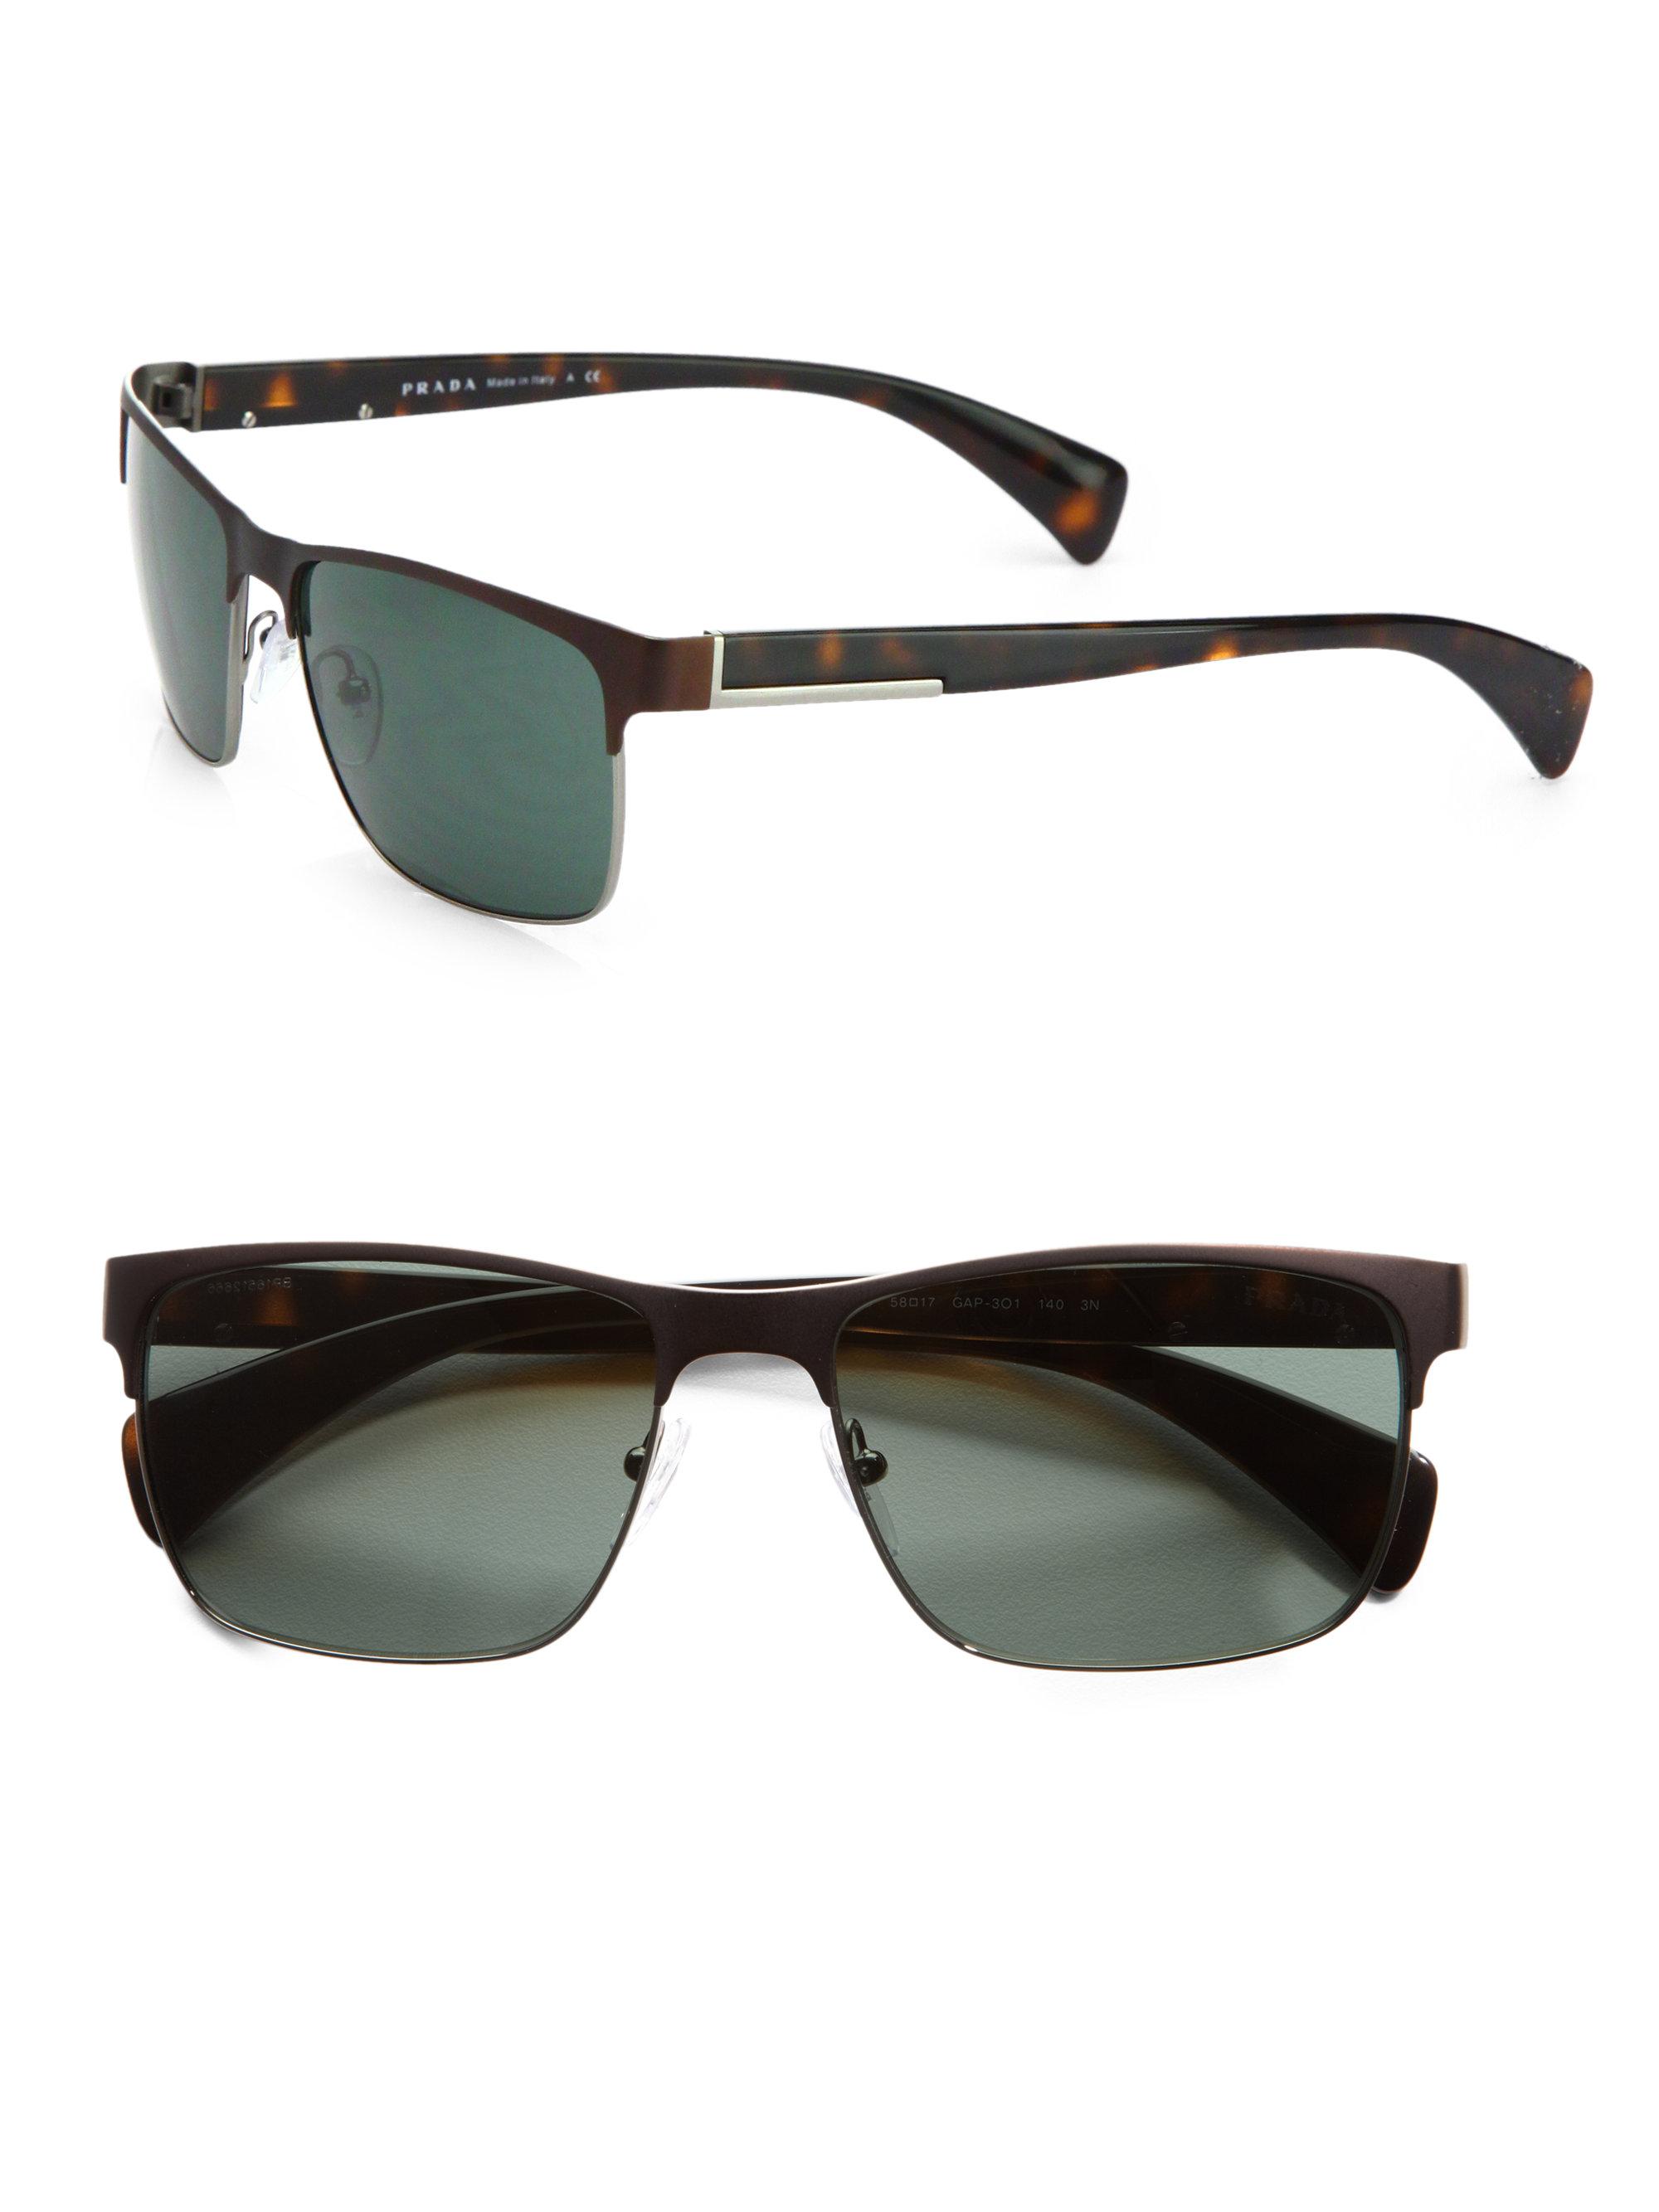 43973df5d145 ... netherlands lyst prada twotone square sunglasses in brown for men 7fd67  f9fb4